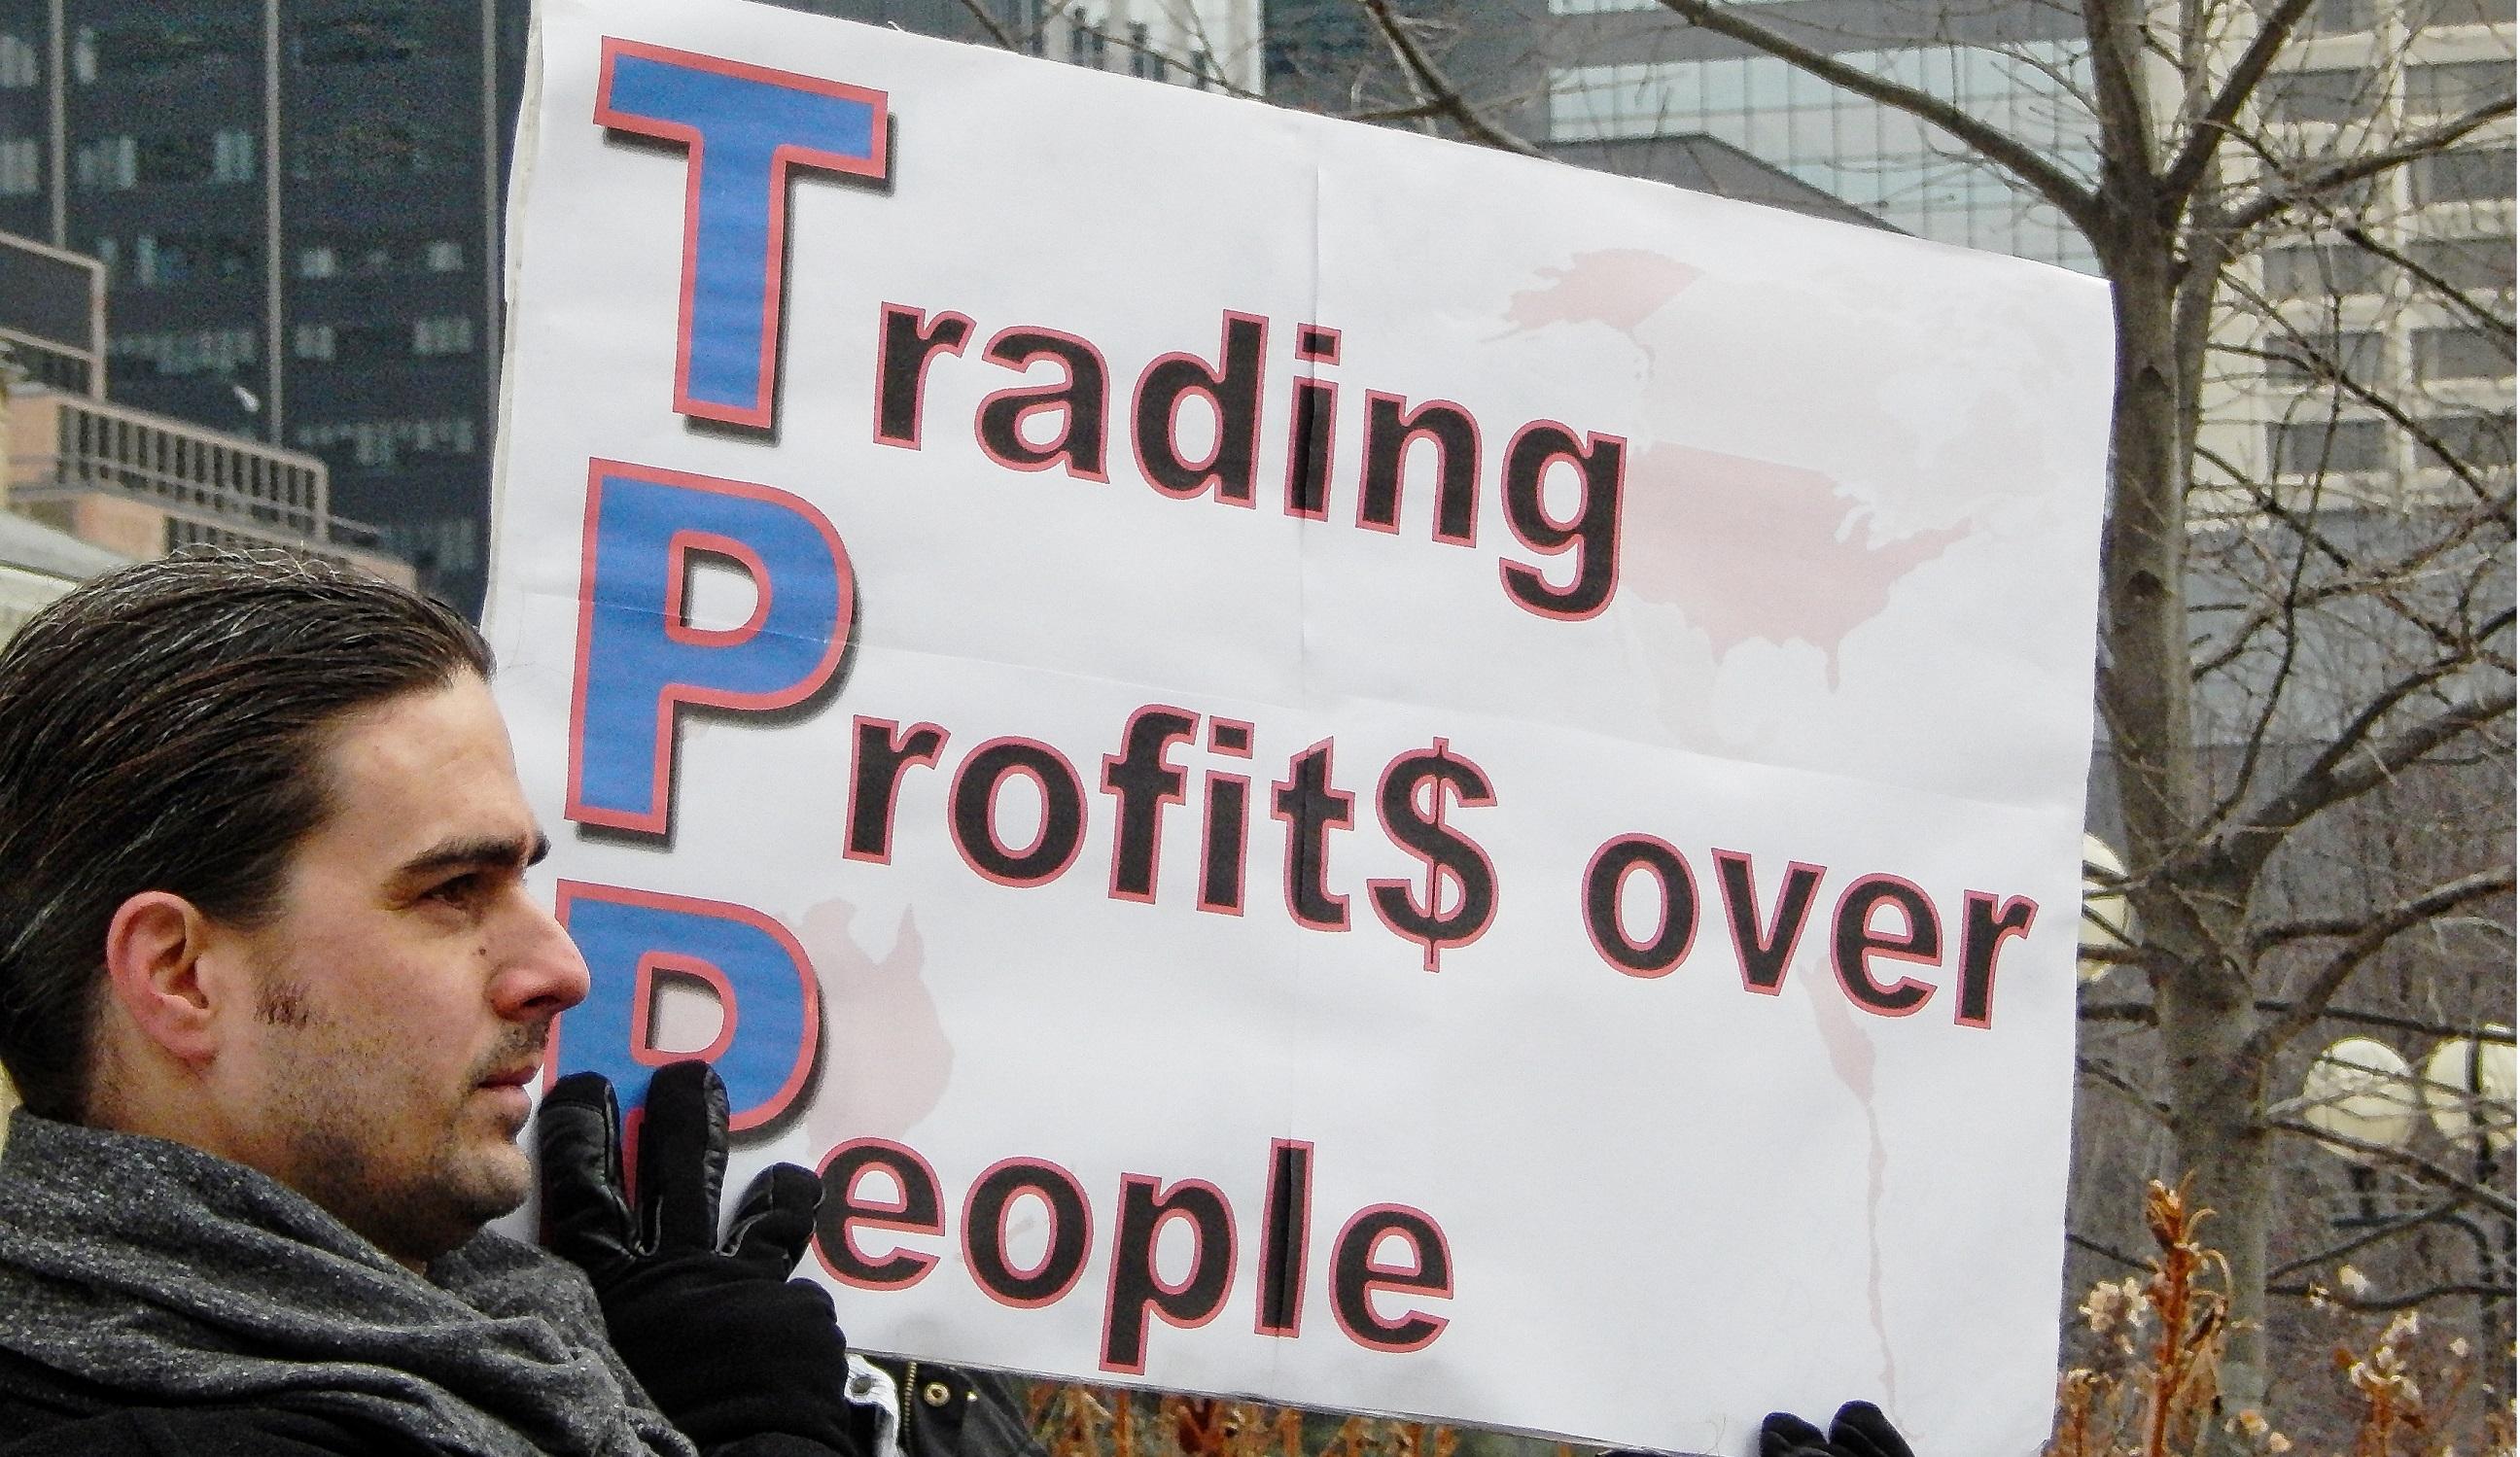 NAFTA's Chapter 11